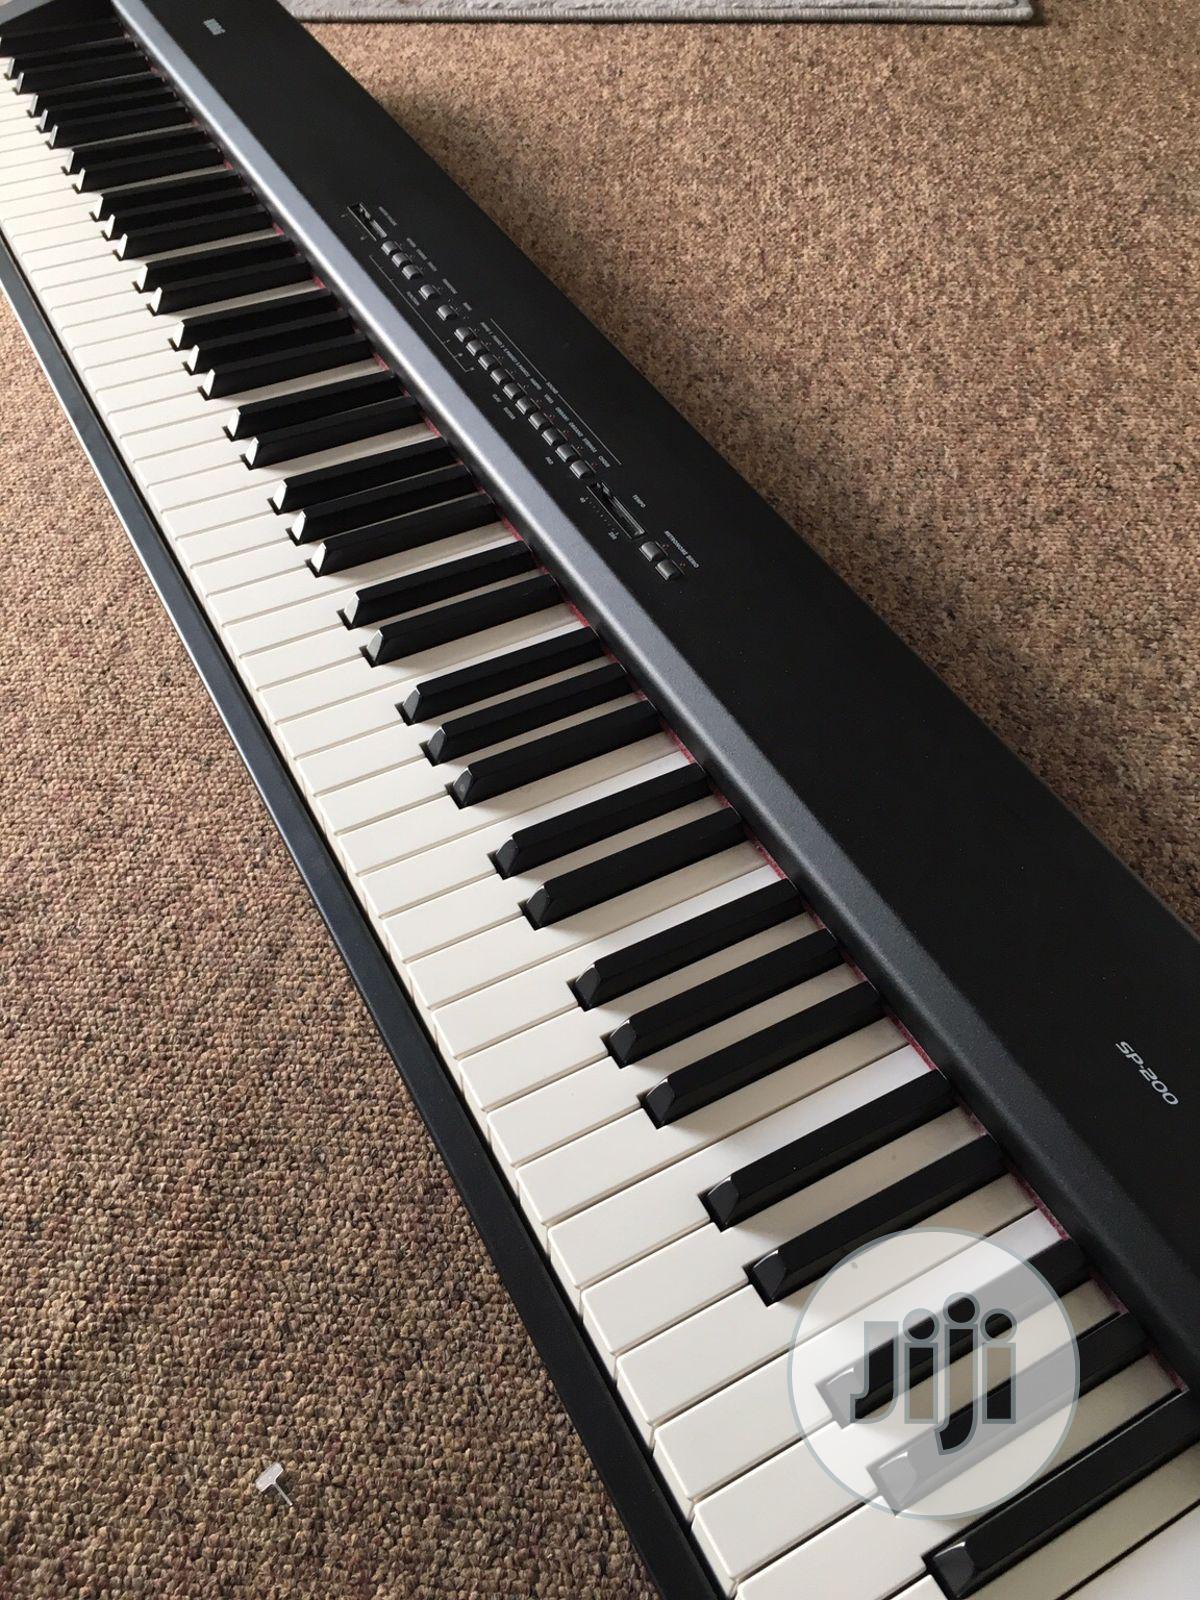 Used Korg SP 200 Digital Piano